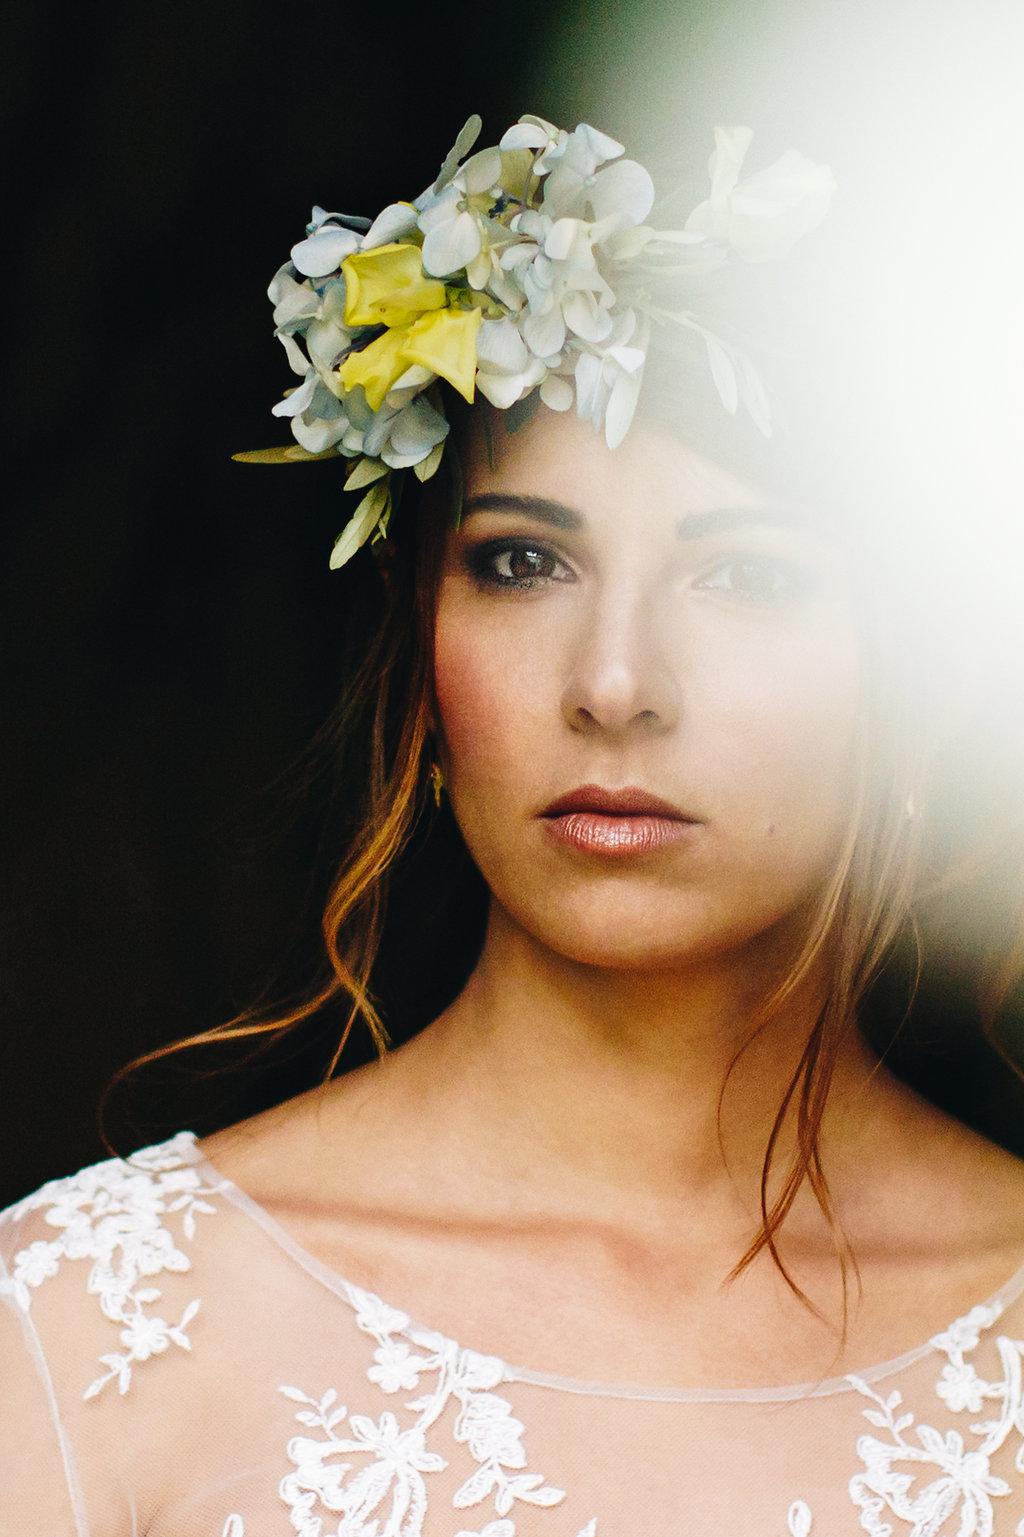 maquillage mariage champetre | MissDelph Beauté